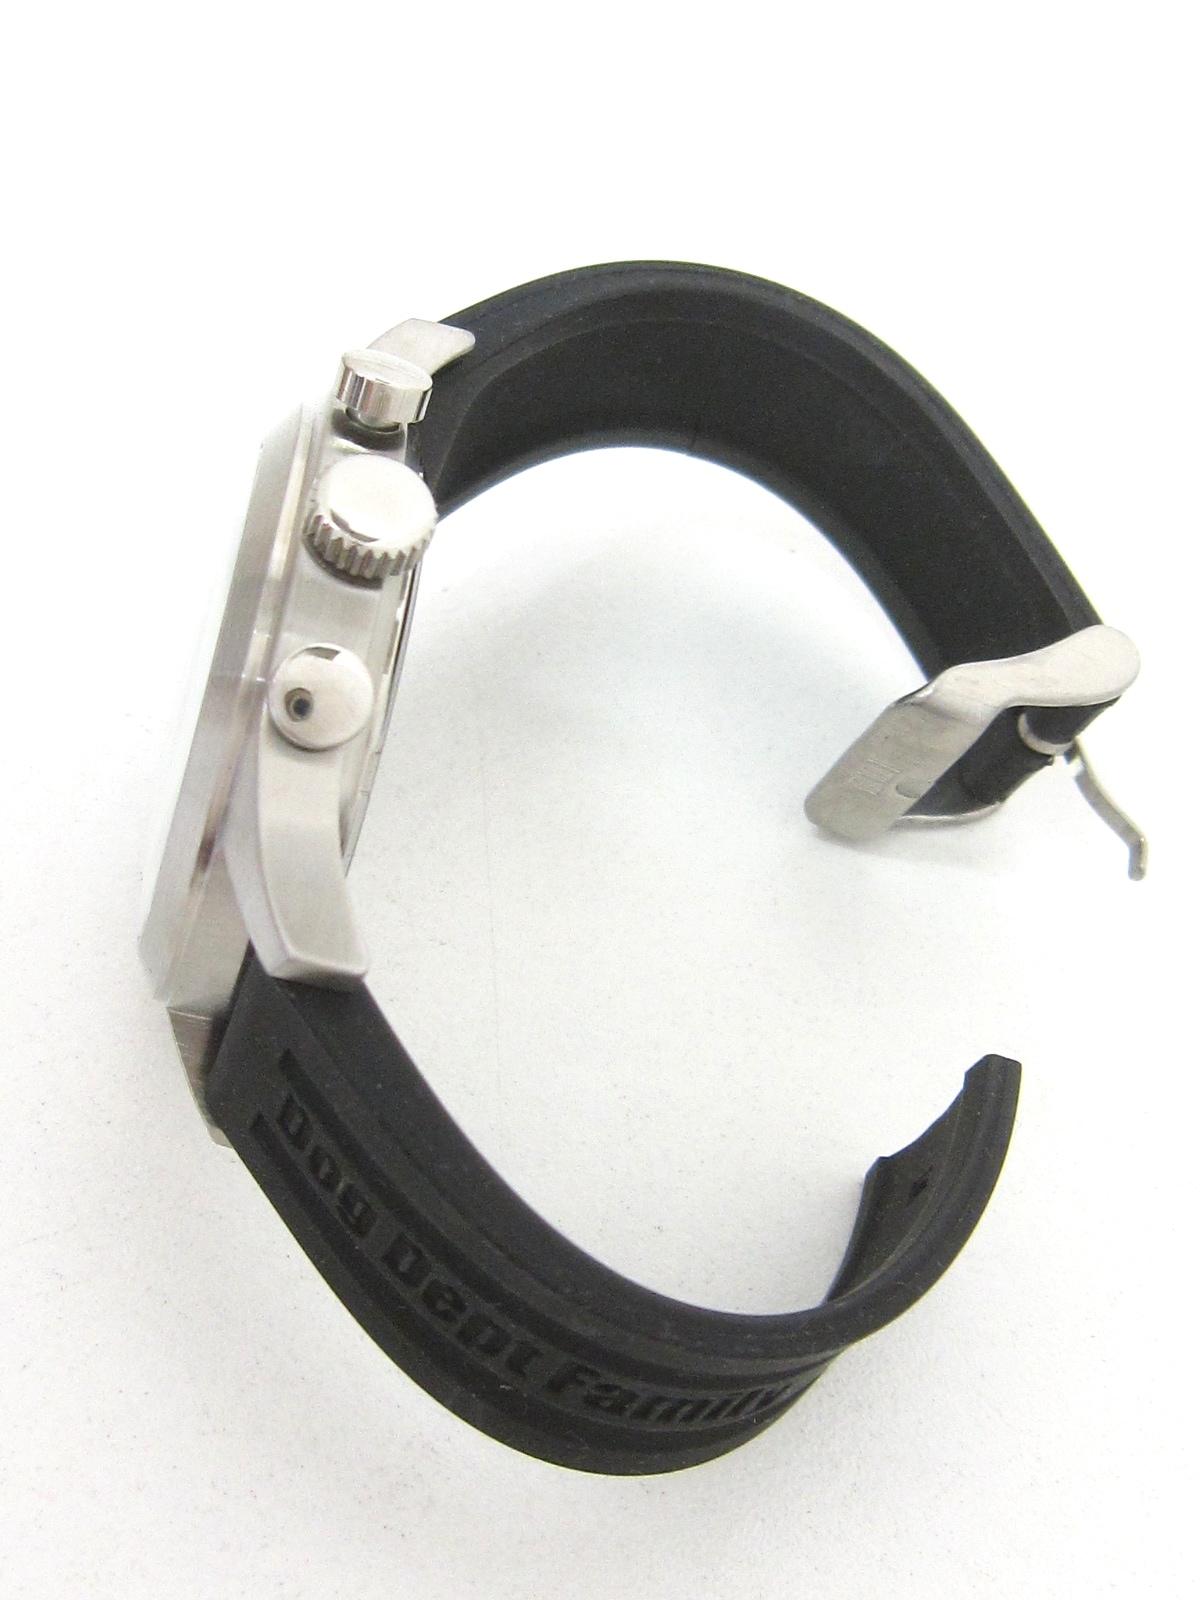 DOG DEPT(ドッグデプト)の腕時計